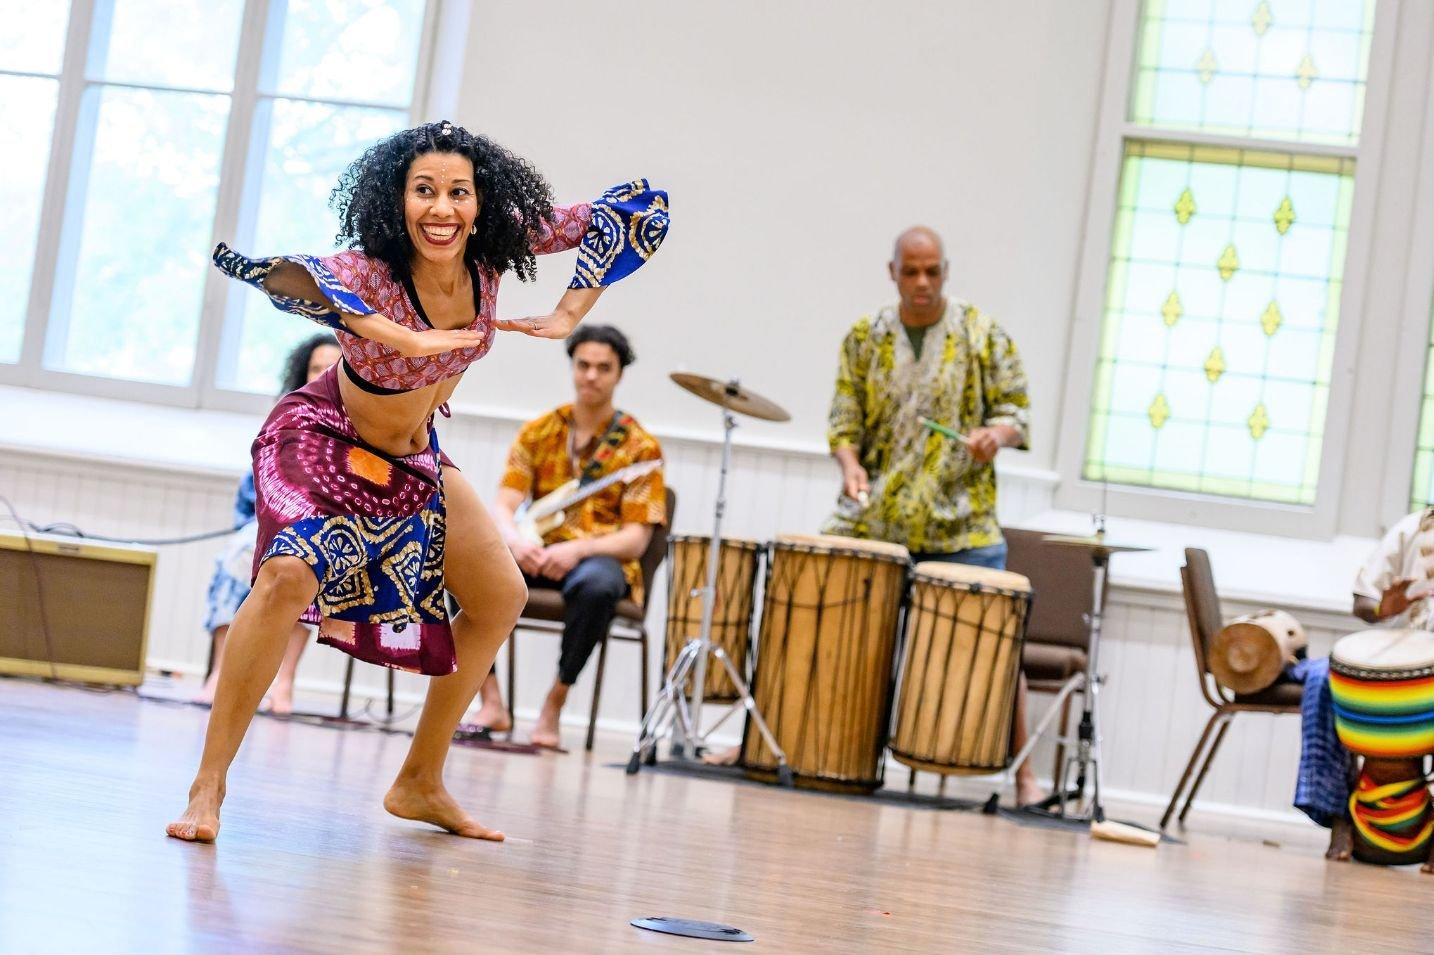 Atelier de danse africaine avec Lua Shayenne